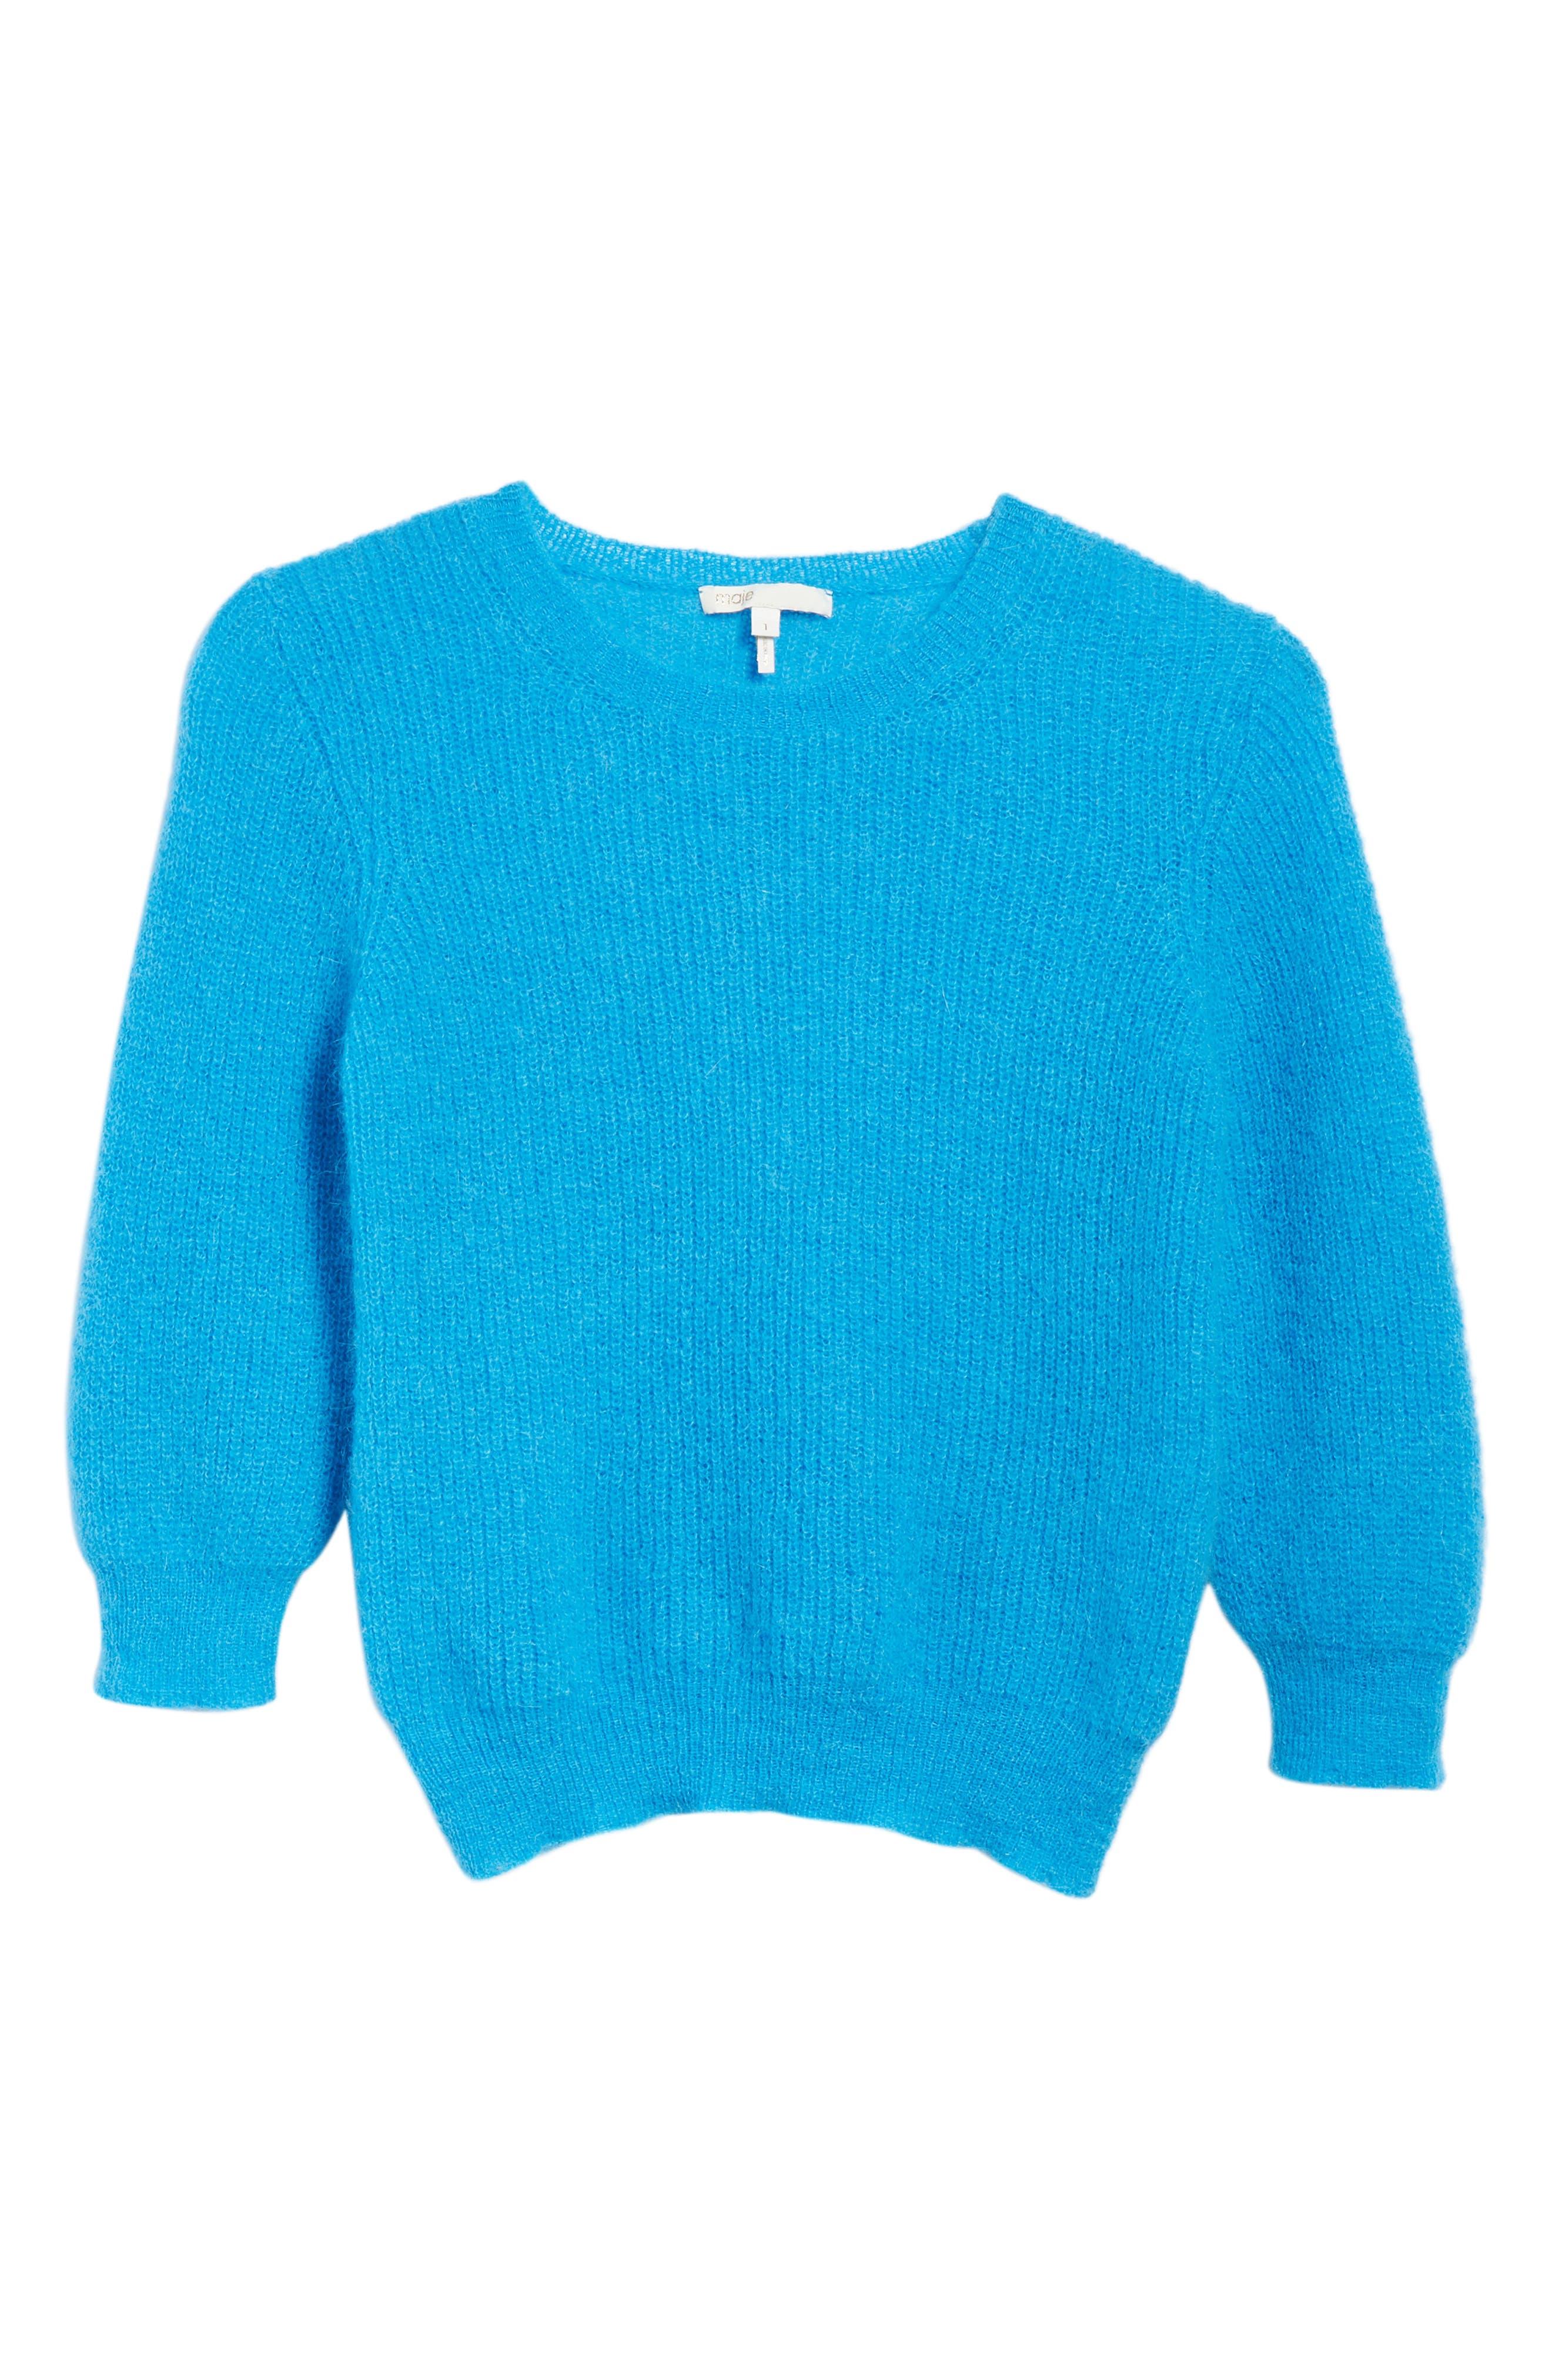 Marcel Sweater,                             Alternate thumbnail 6, color,                             Blue